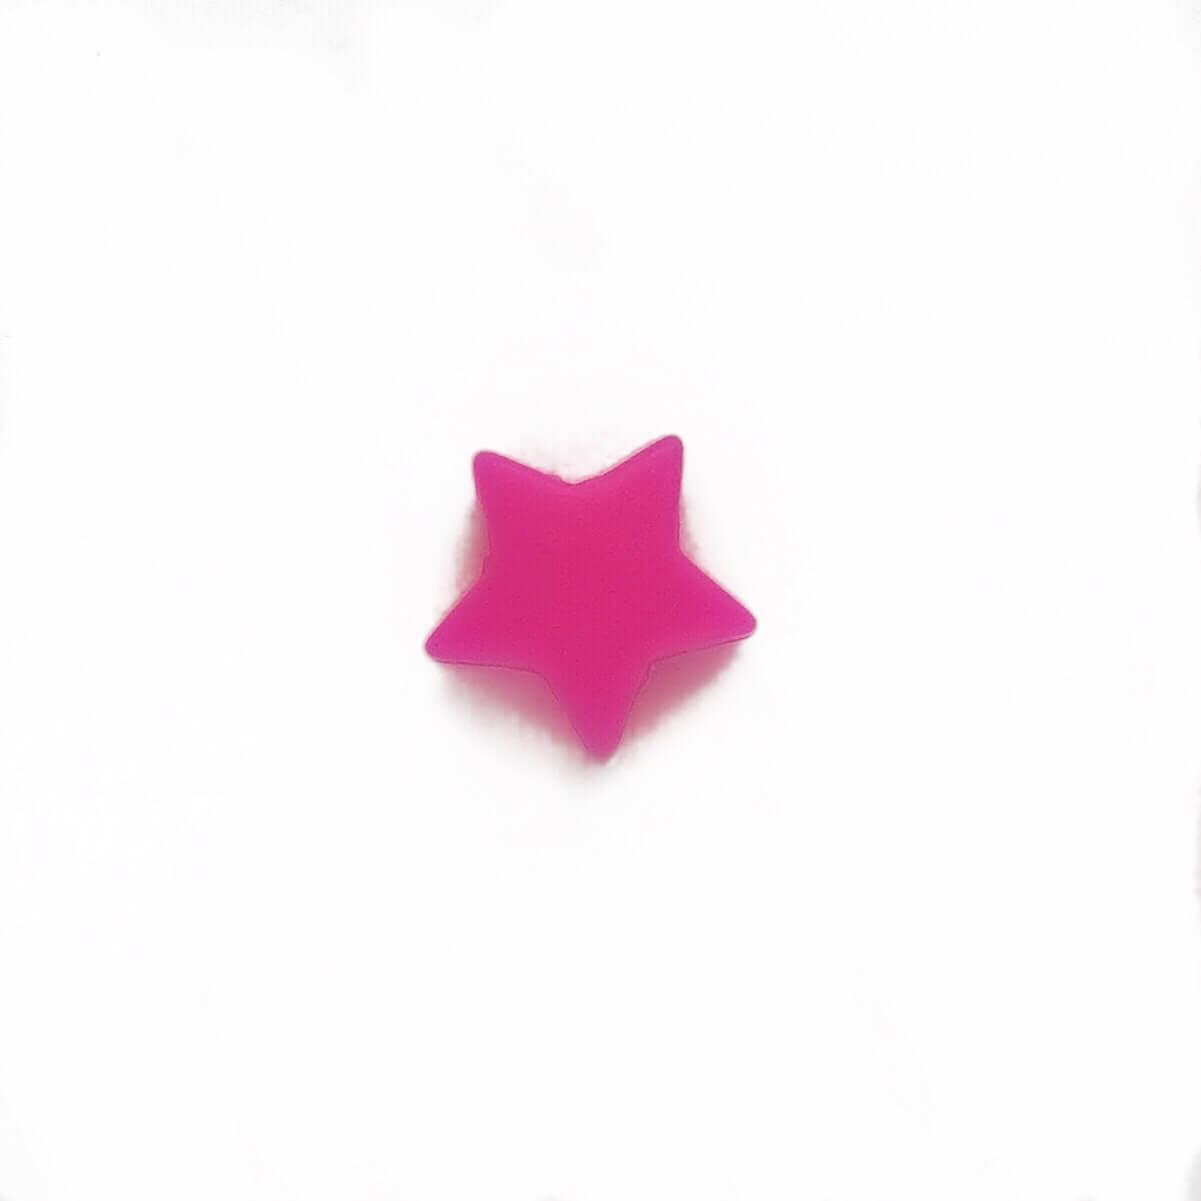 Мини звездочка (малина) бусина из пищевого силикона